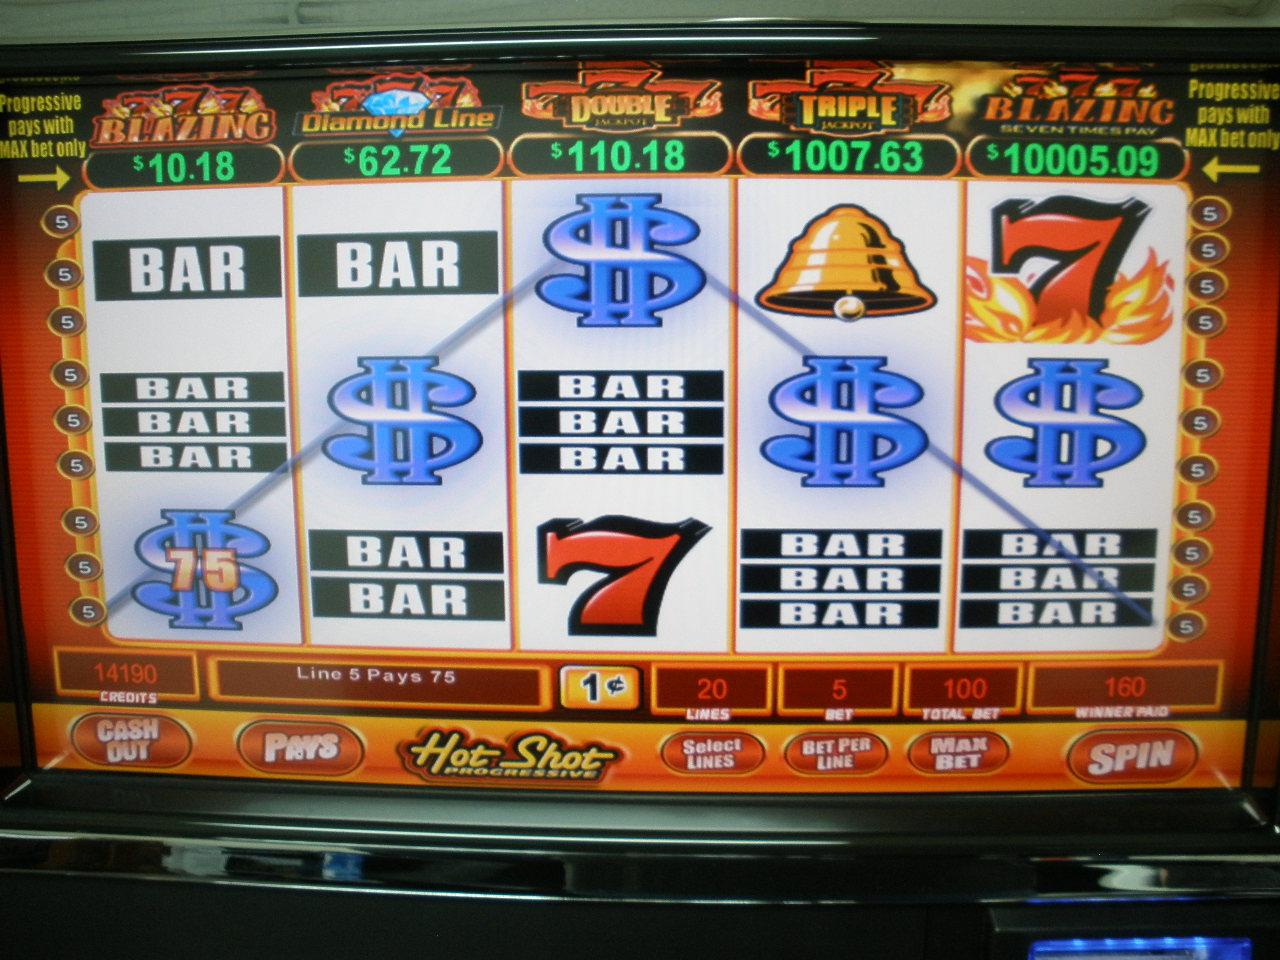 Vegas spins no deposit bonus